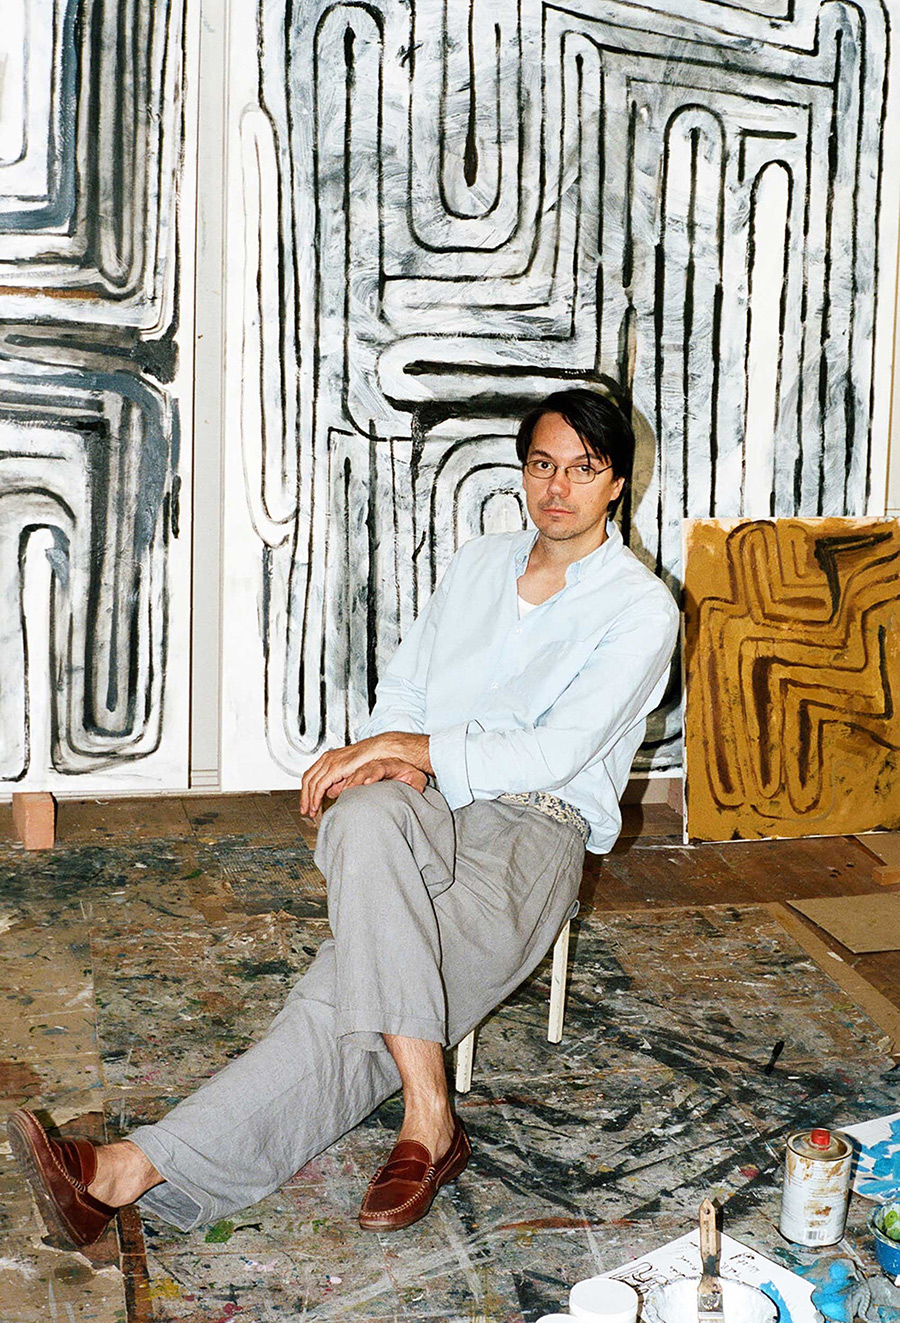 josef zekoff, artist, studio, paintings on wall, portrait